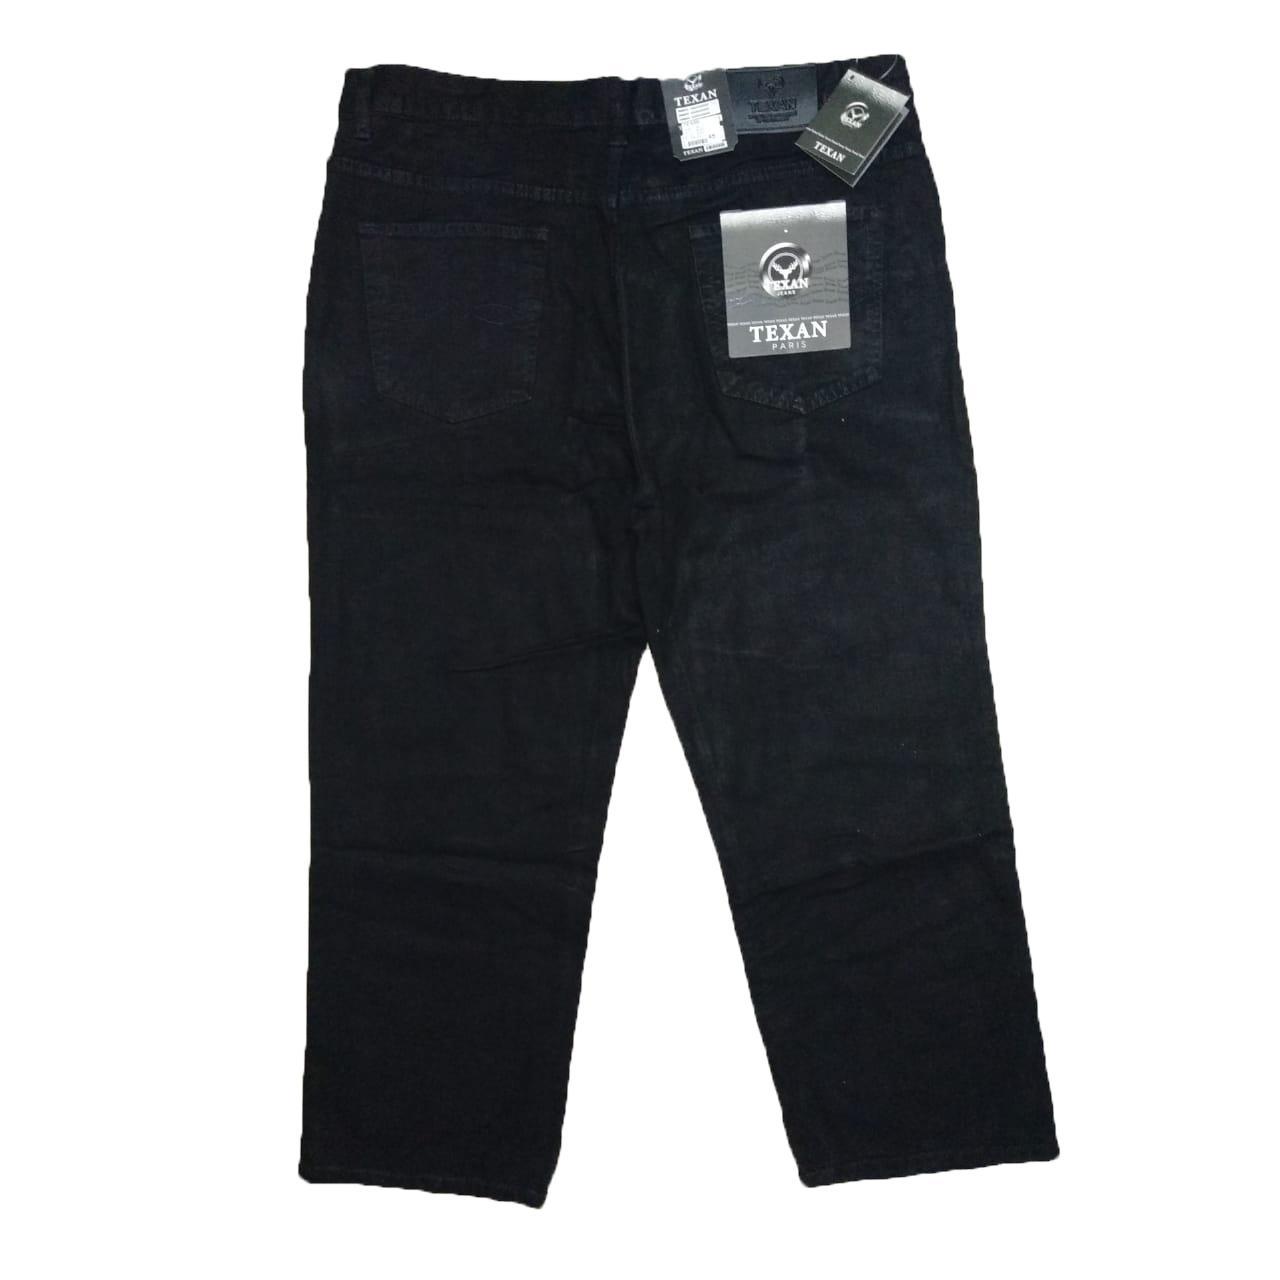 Celana Jeans Panjang Pria Jumbo Big Size 40-44 - Warna Biru Jeans Blue dan